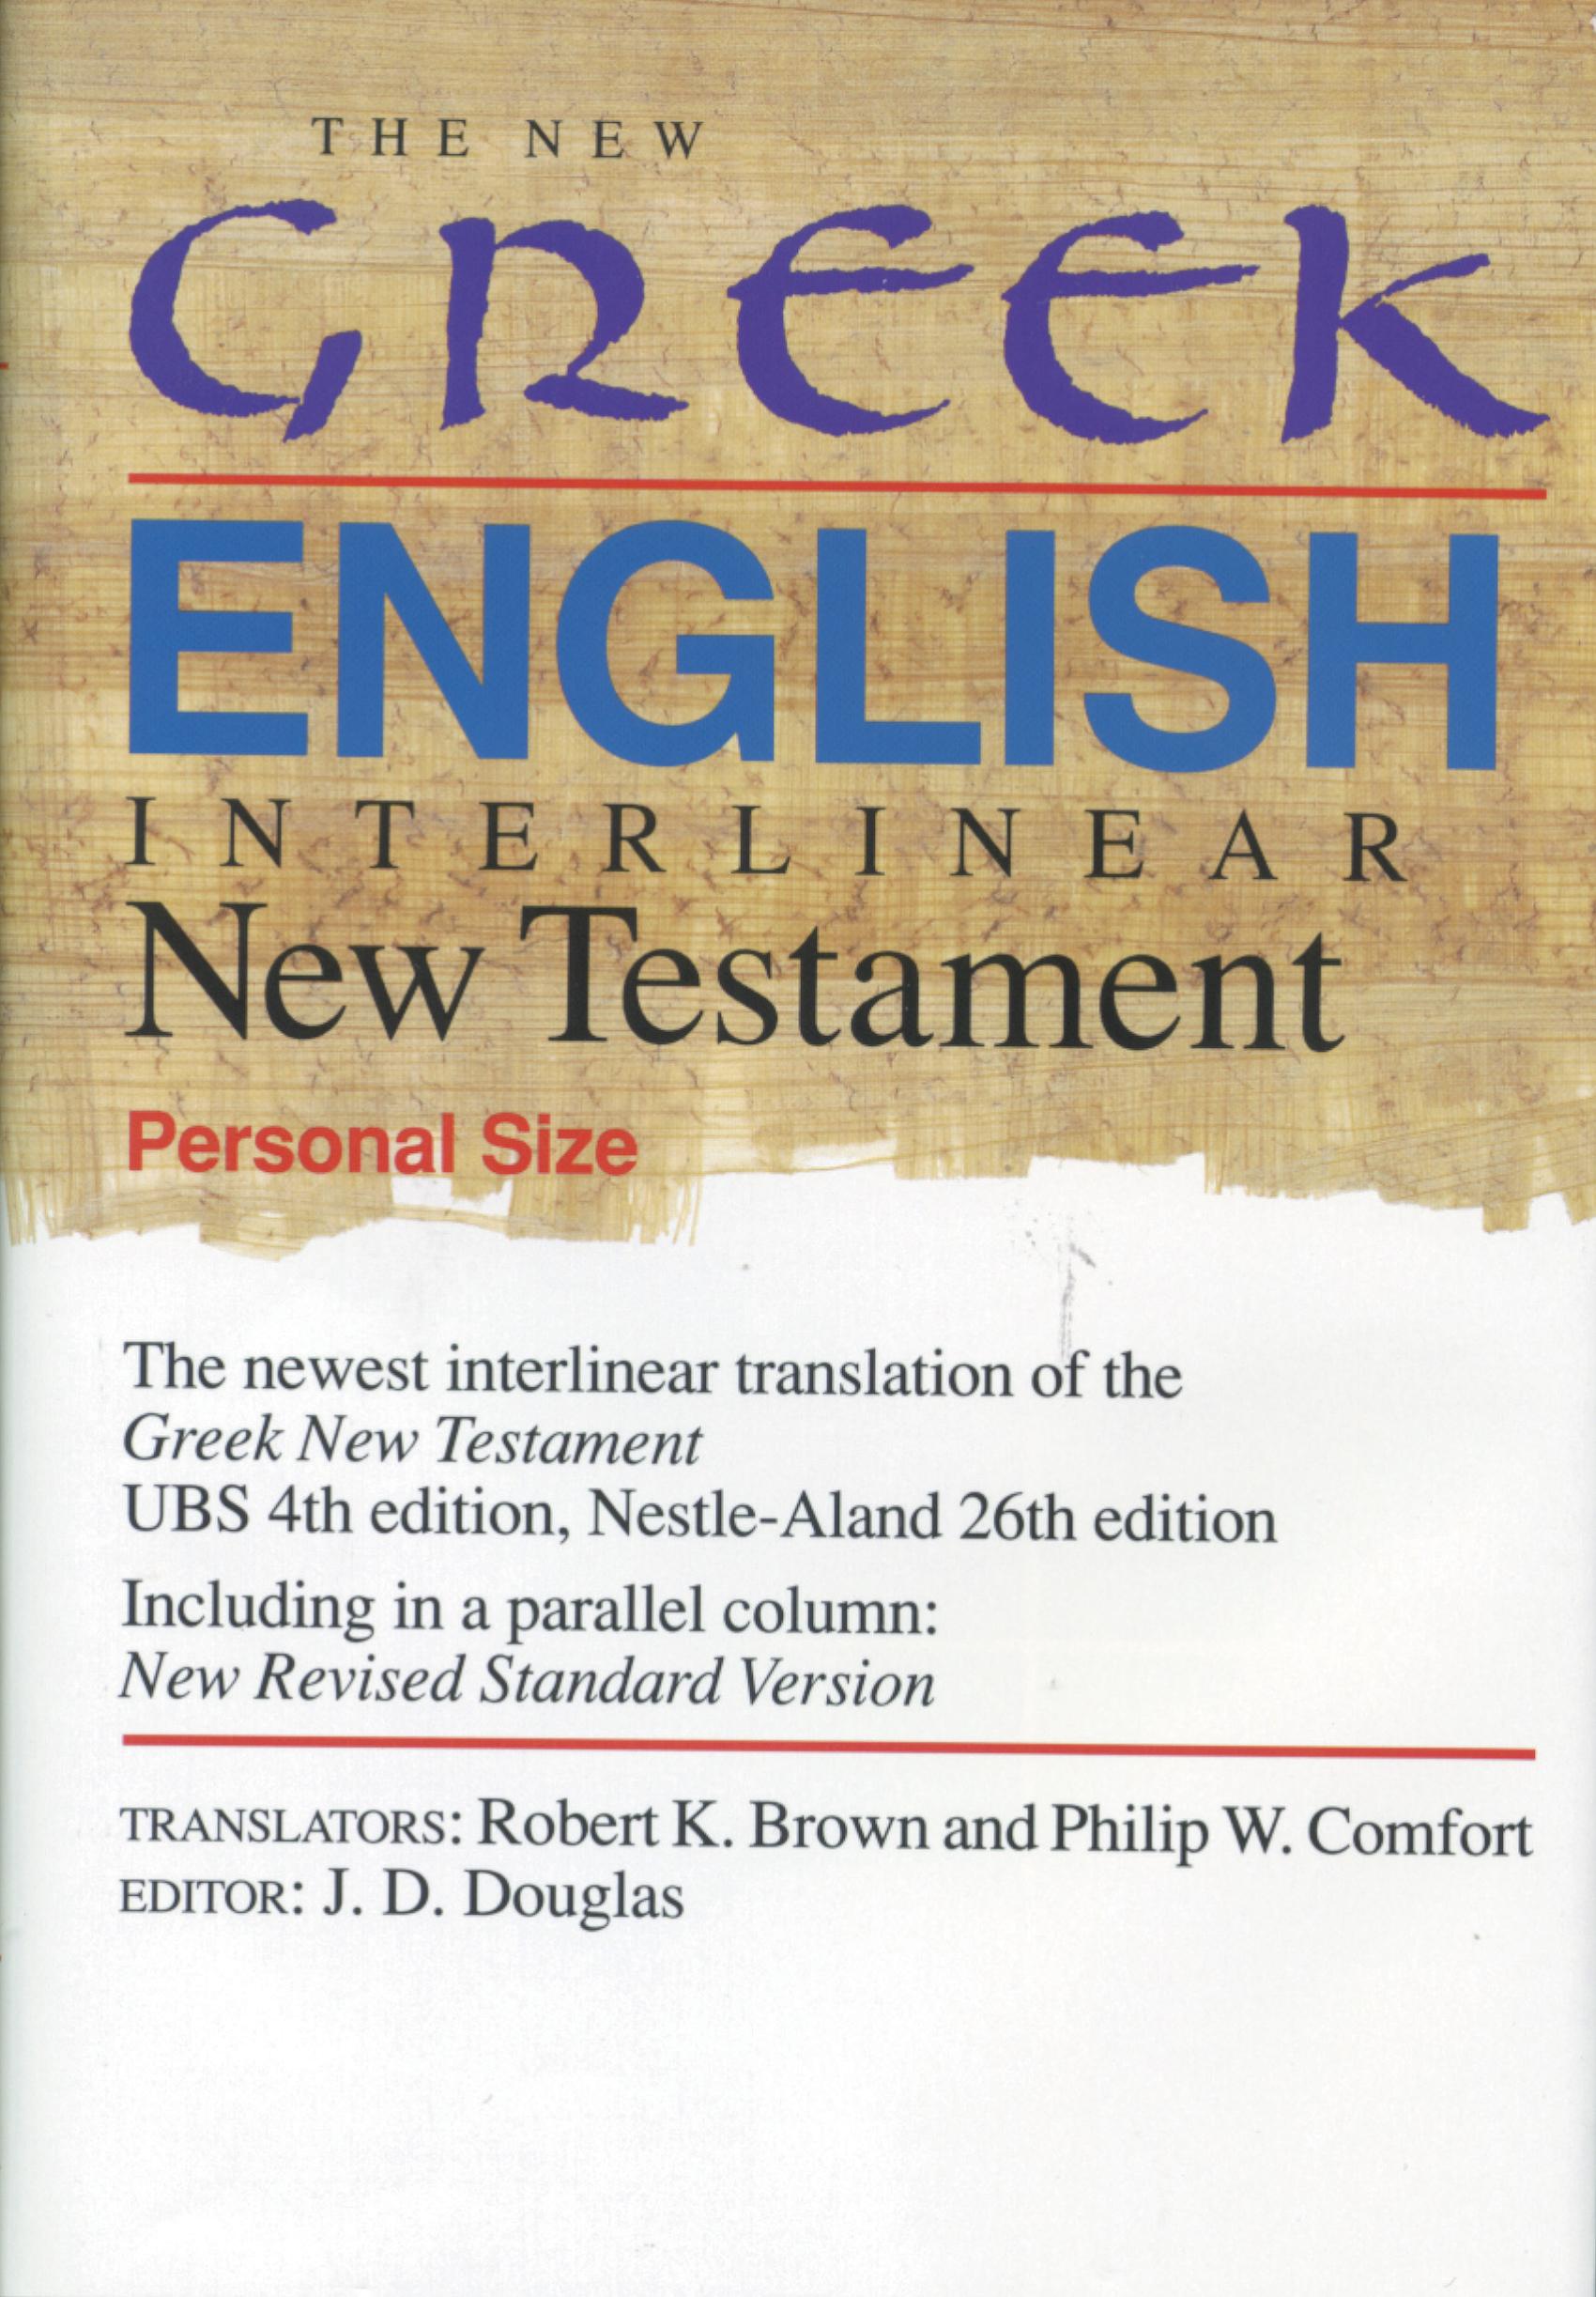 The New Greek-English Interlinear NT